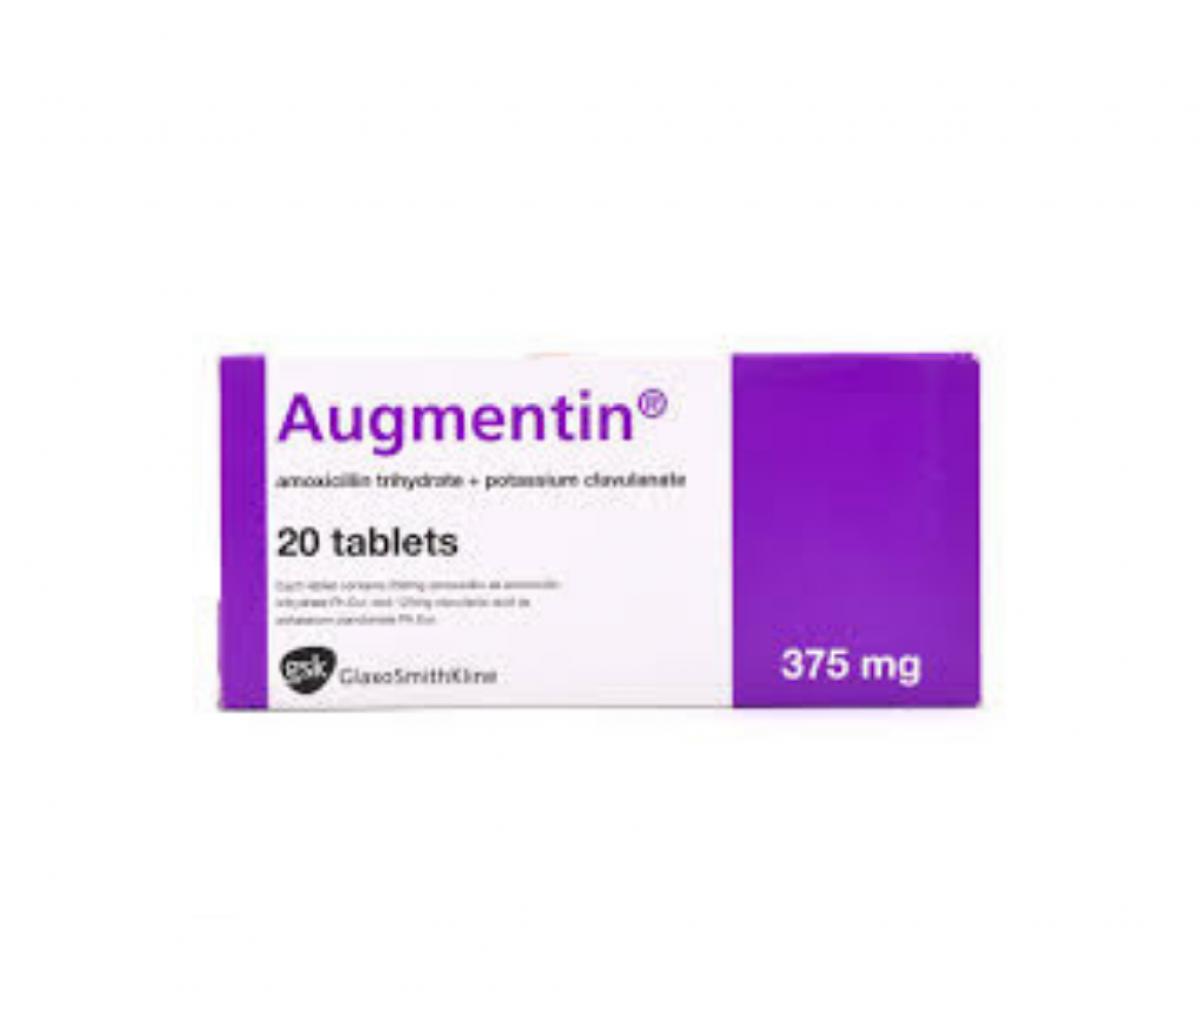 Augmentin 375mg Tablet